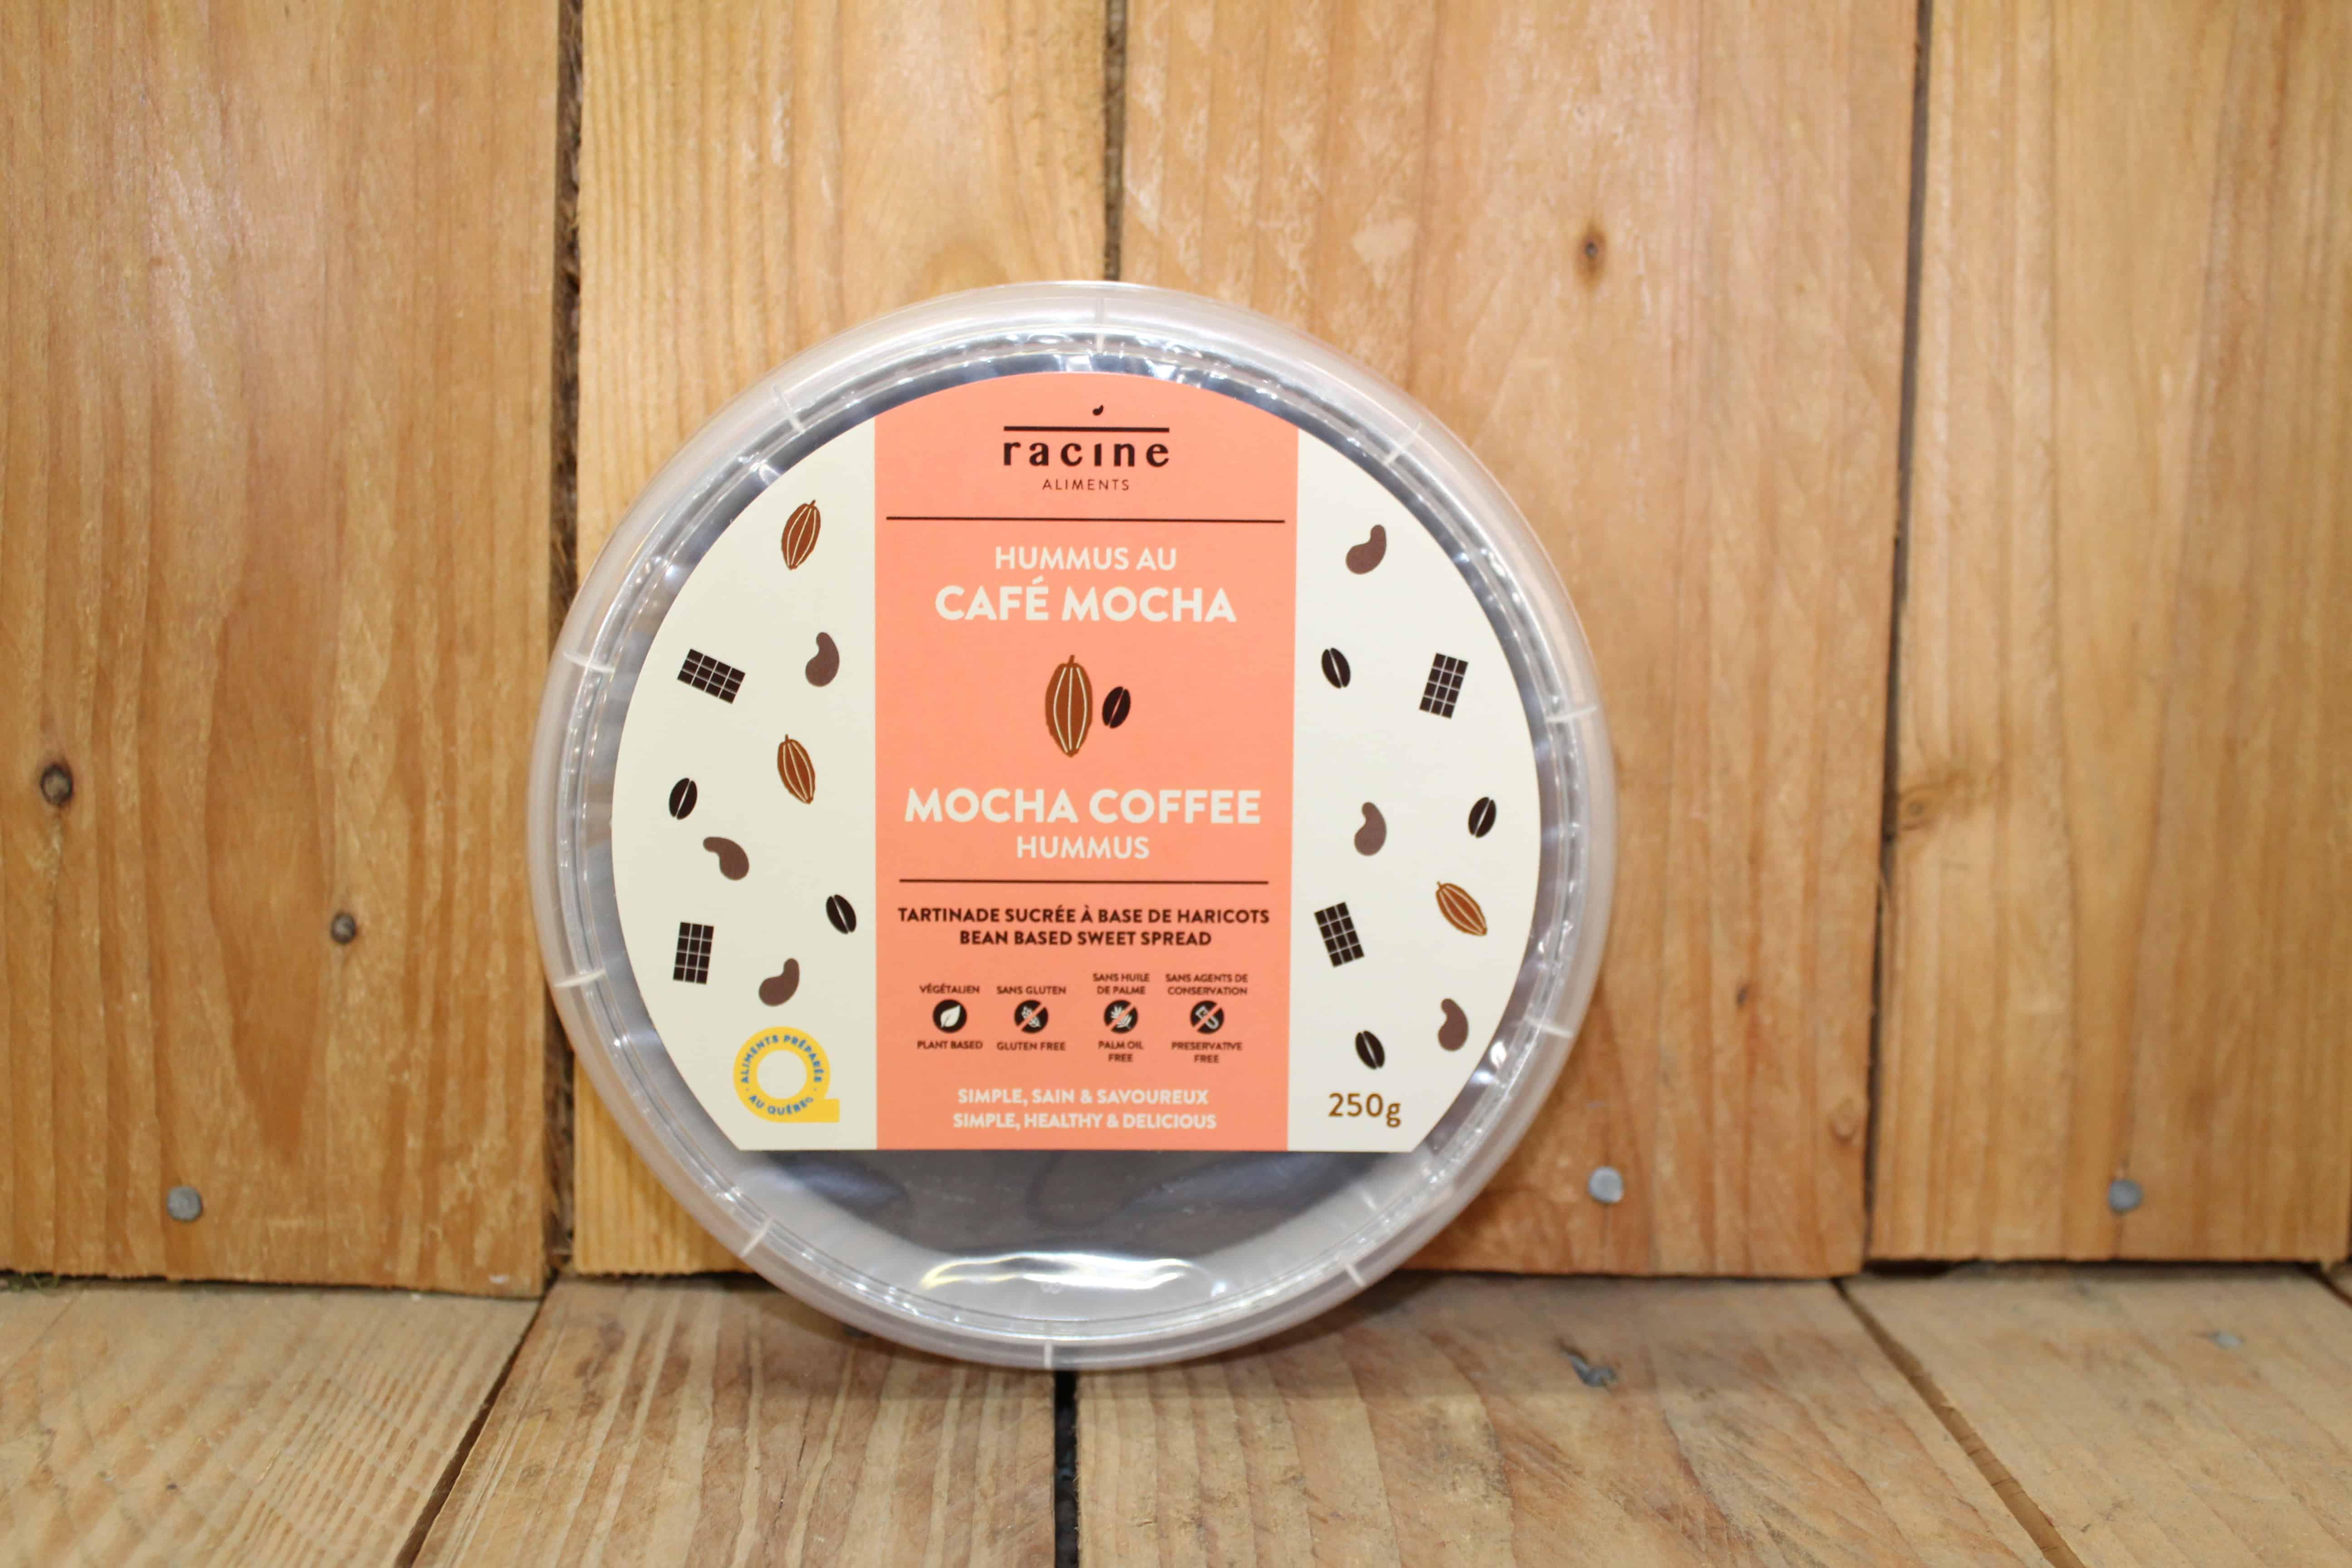 Racine – Hummus – Mocha Coffee (250g)